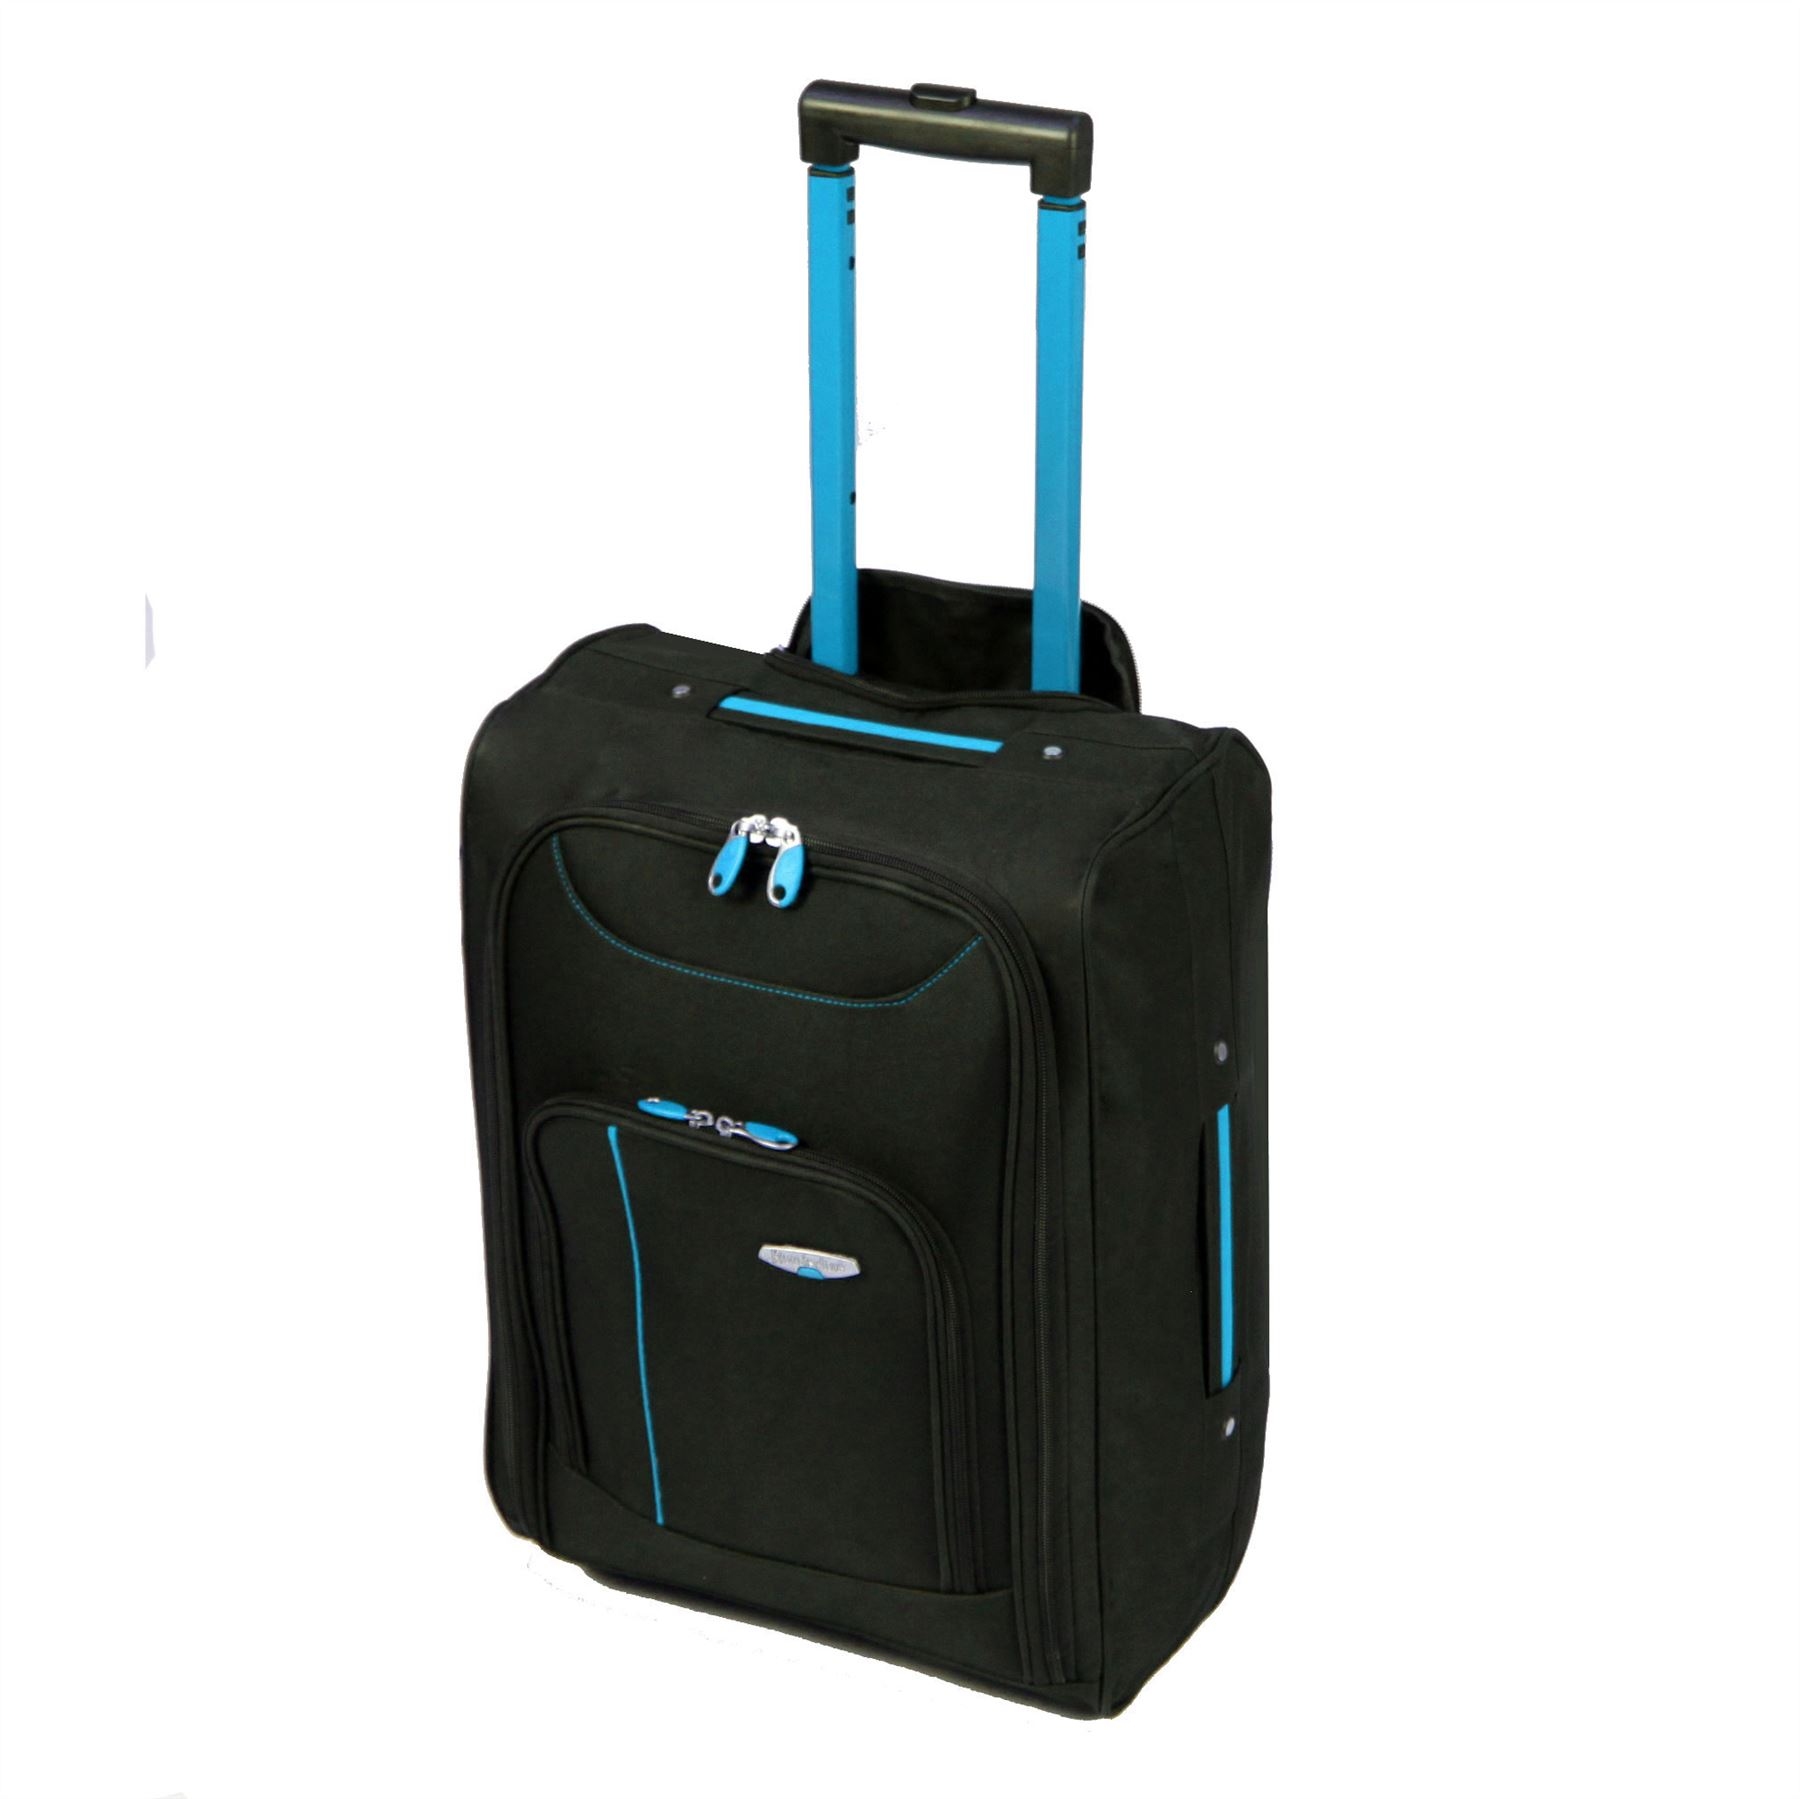 lightweight cabin approved luggage trolley holdall flight. Black Bedroom Furniture Sets. Home Design Ideas